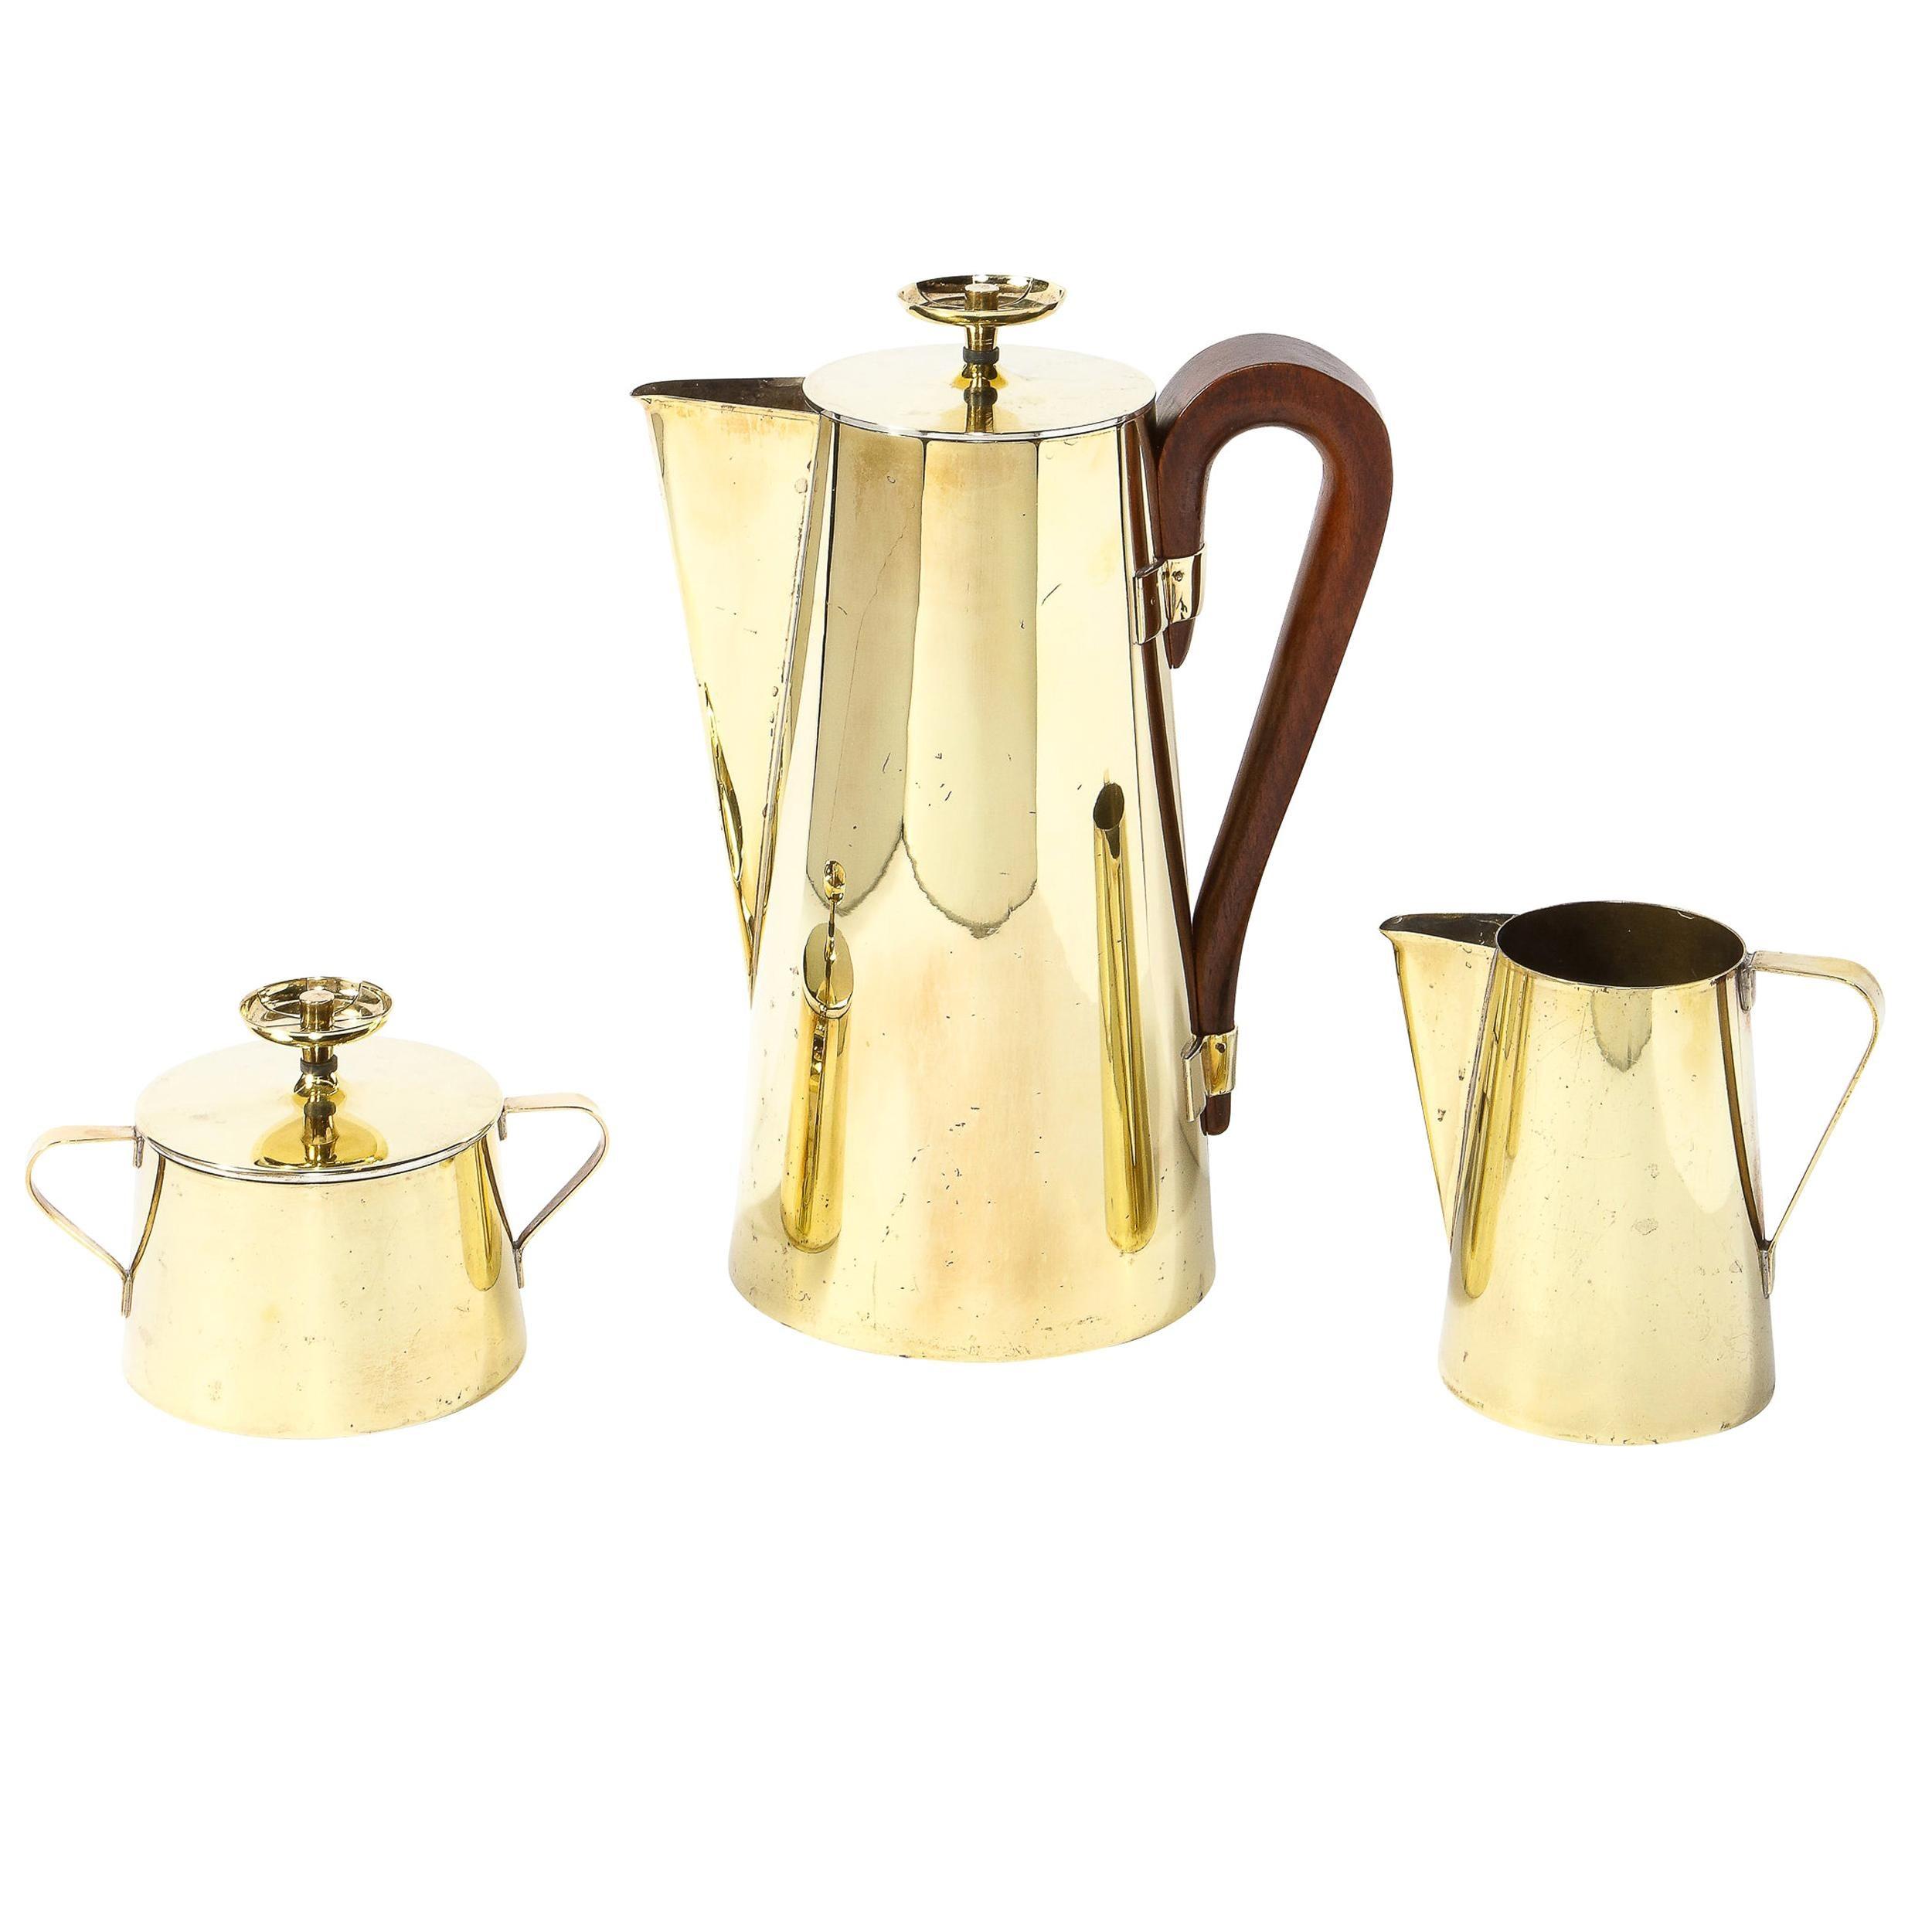 Tommi Parzinger for Dorlyn Silversmiths Tea Service in Polished Brass & Walnut